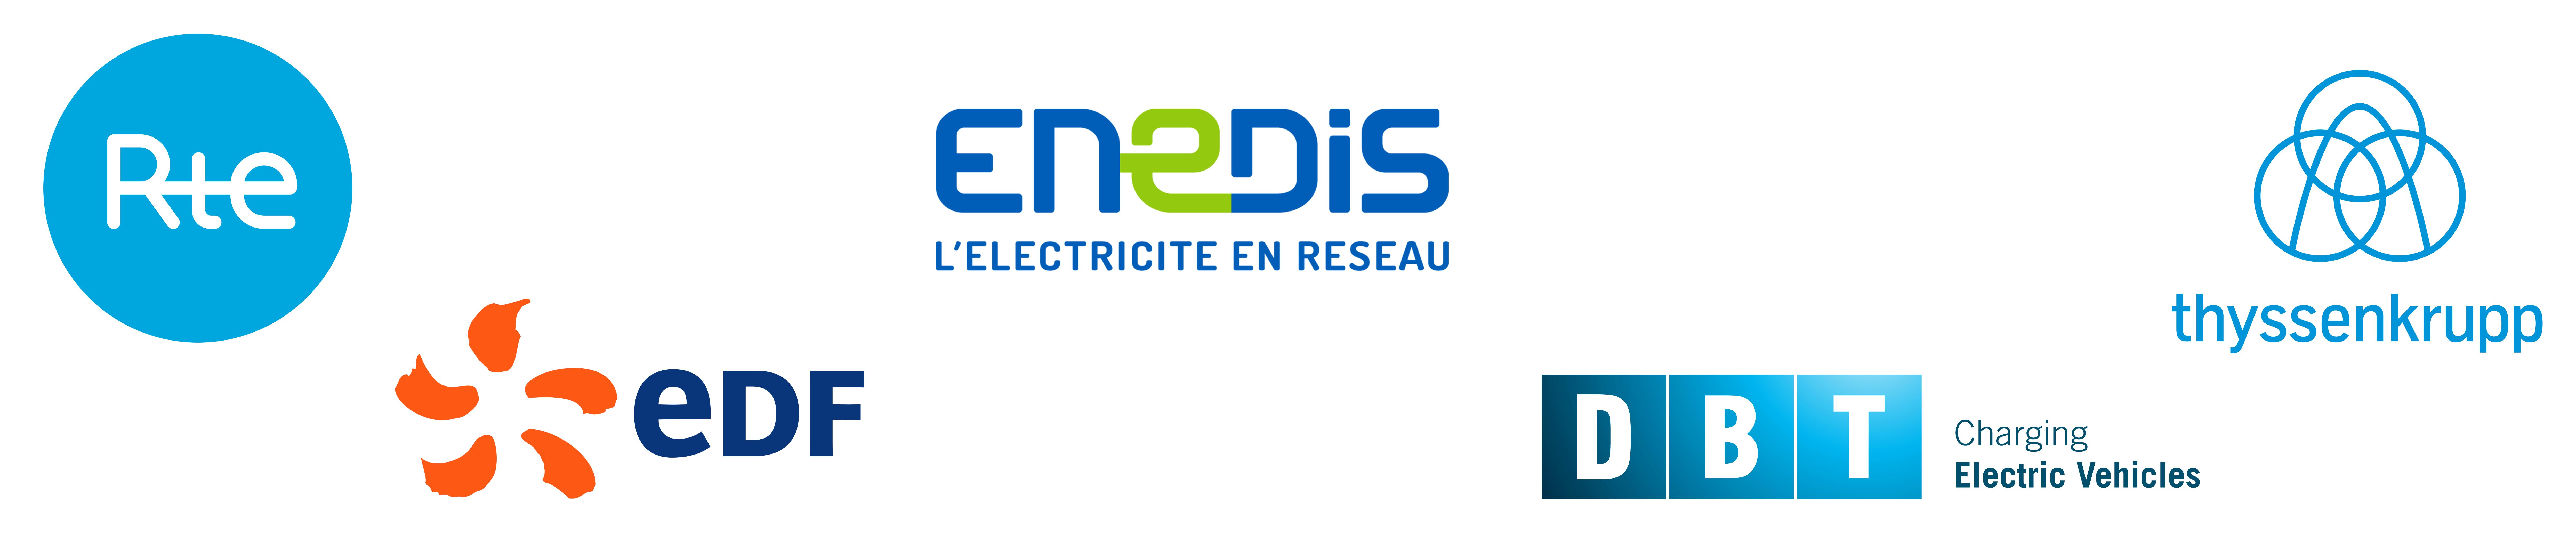 bandeau logos soutiens edf rte enedis dbt thyssenkrupp elctrical steel